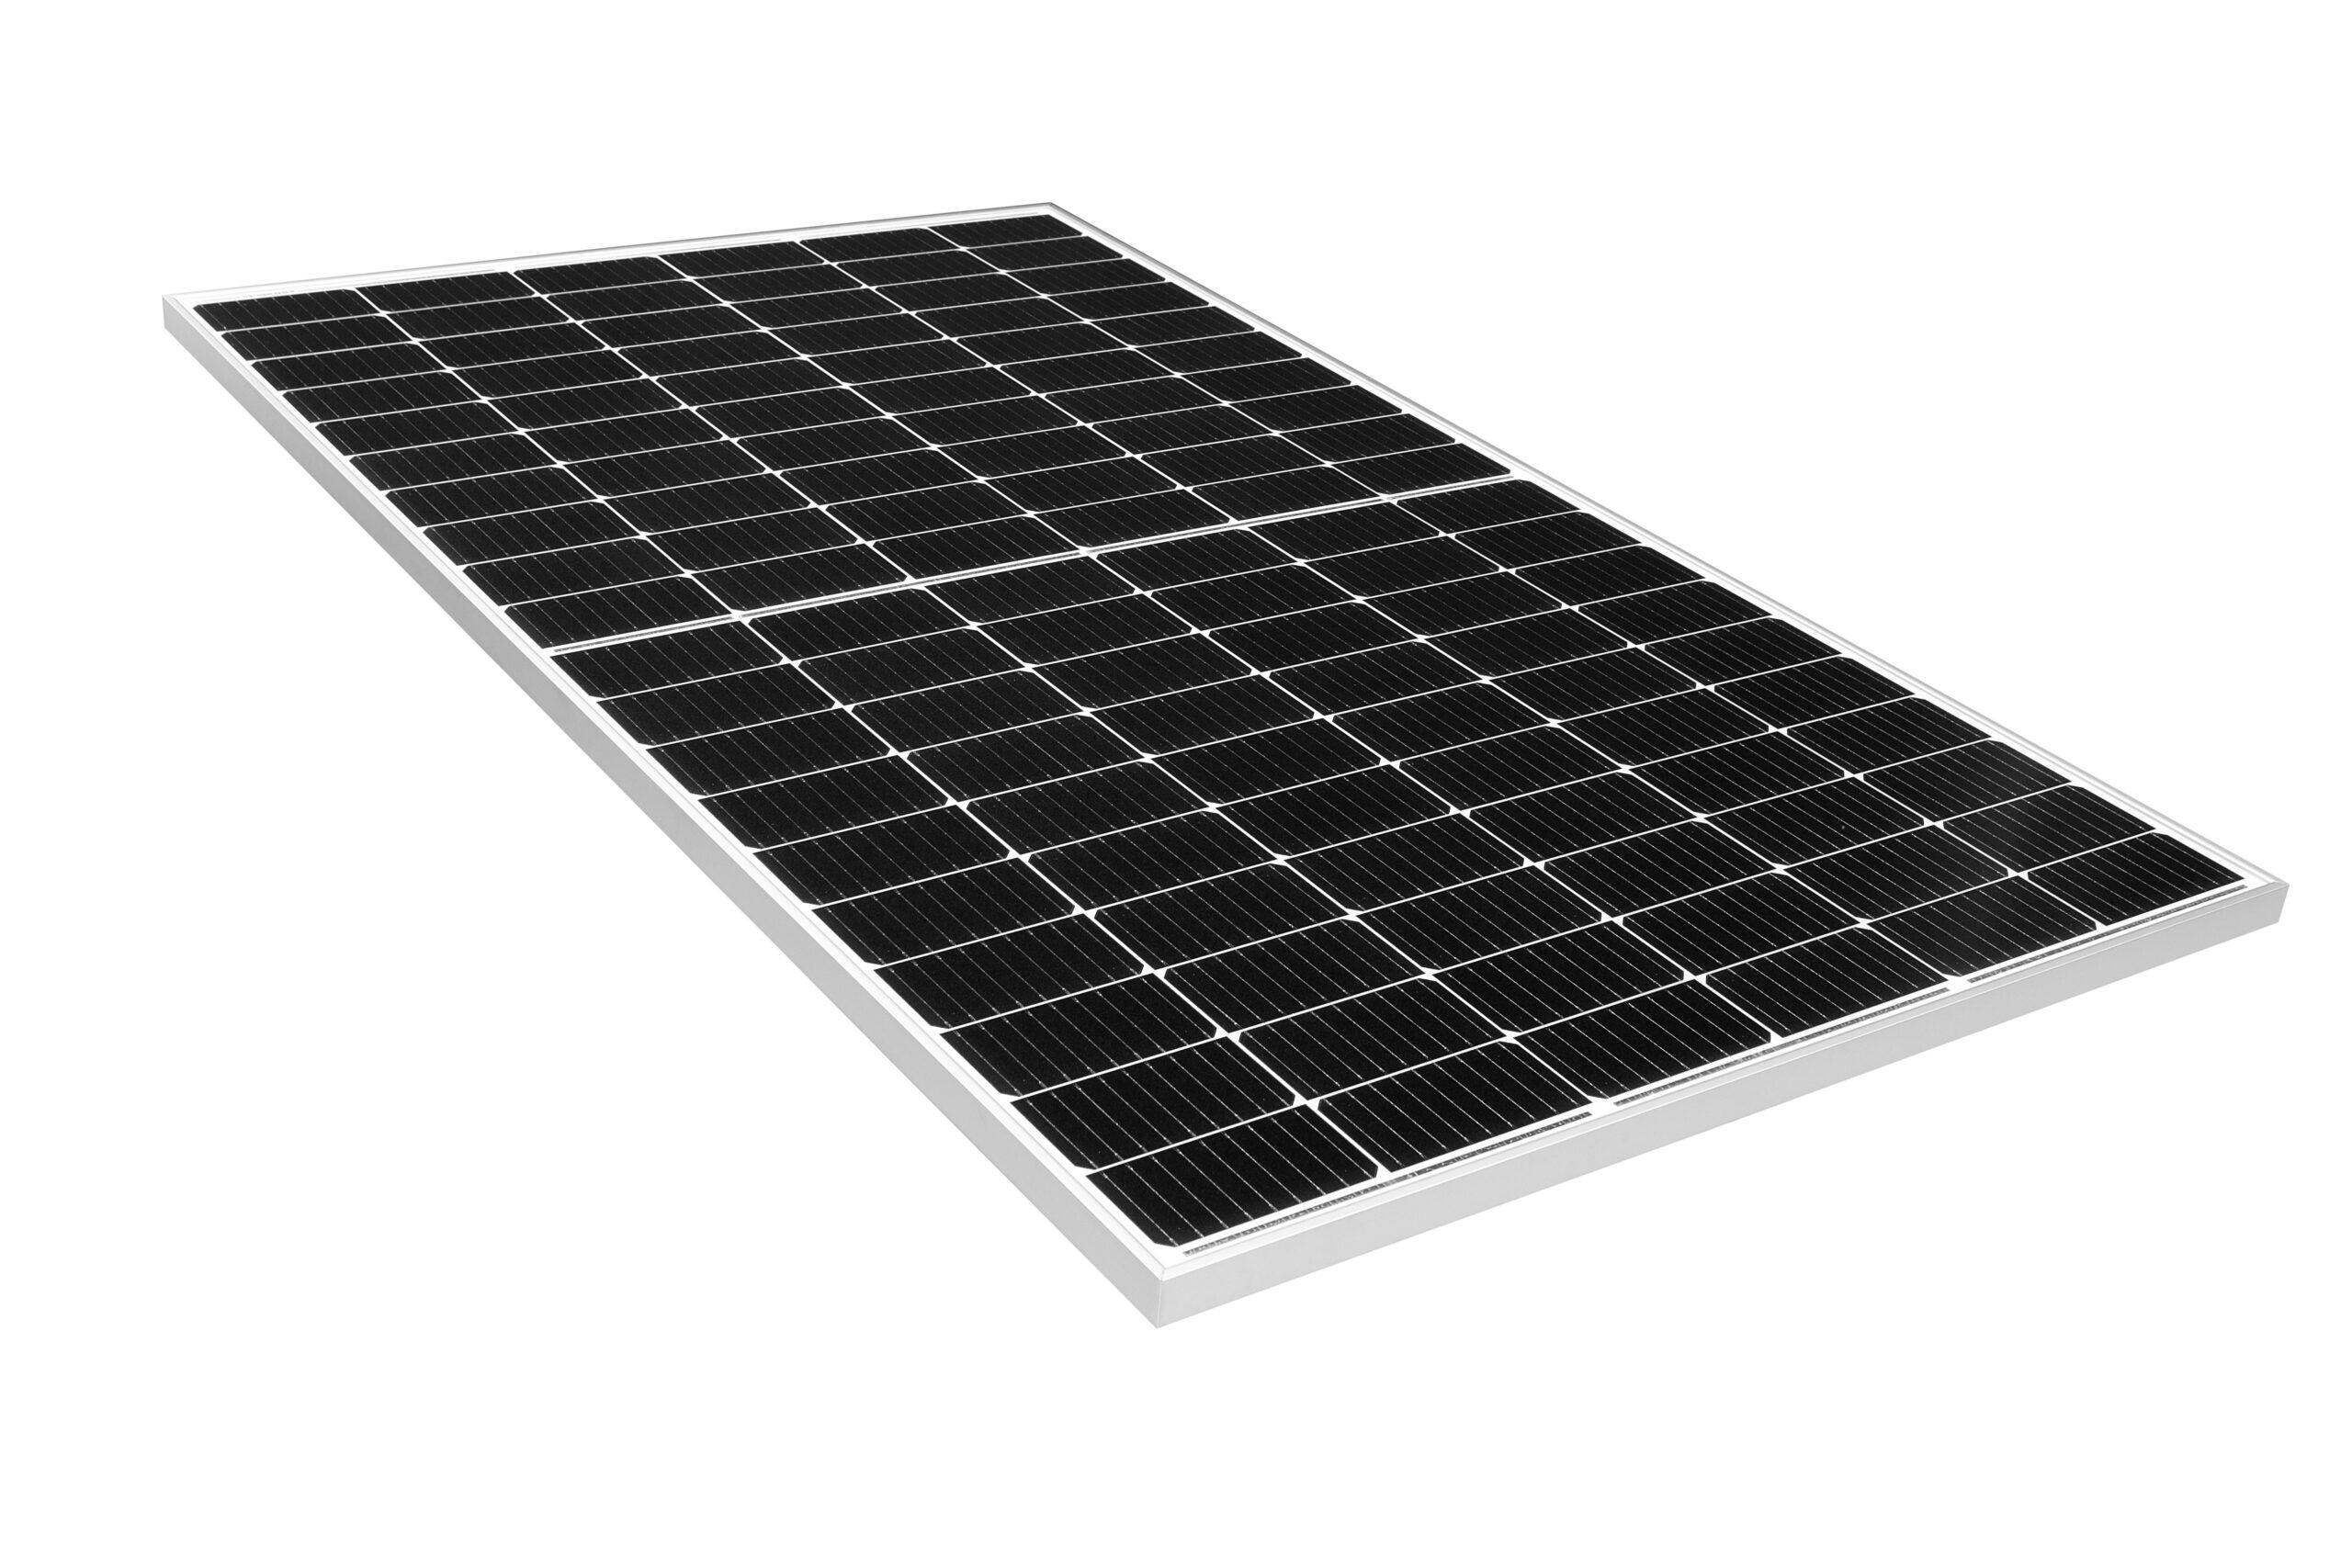 Monocrystalline Half Cell 360-385W Solar Module Manufacturers, Monocrystalline Half Cell 360-385W Solar Module Factory, Supply Monocrystalline Half Cell 360-385W Solar Module